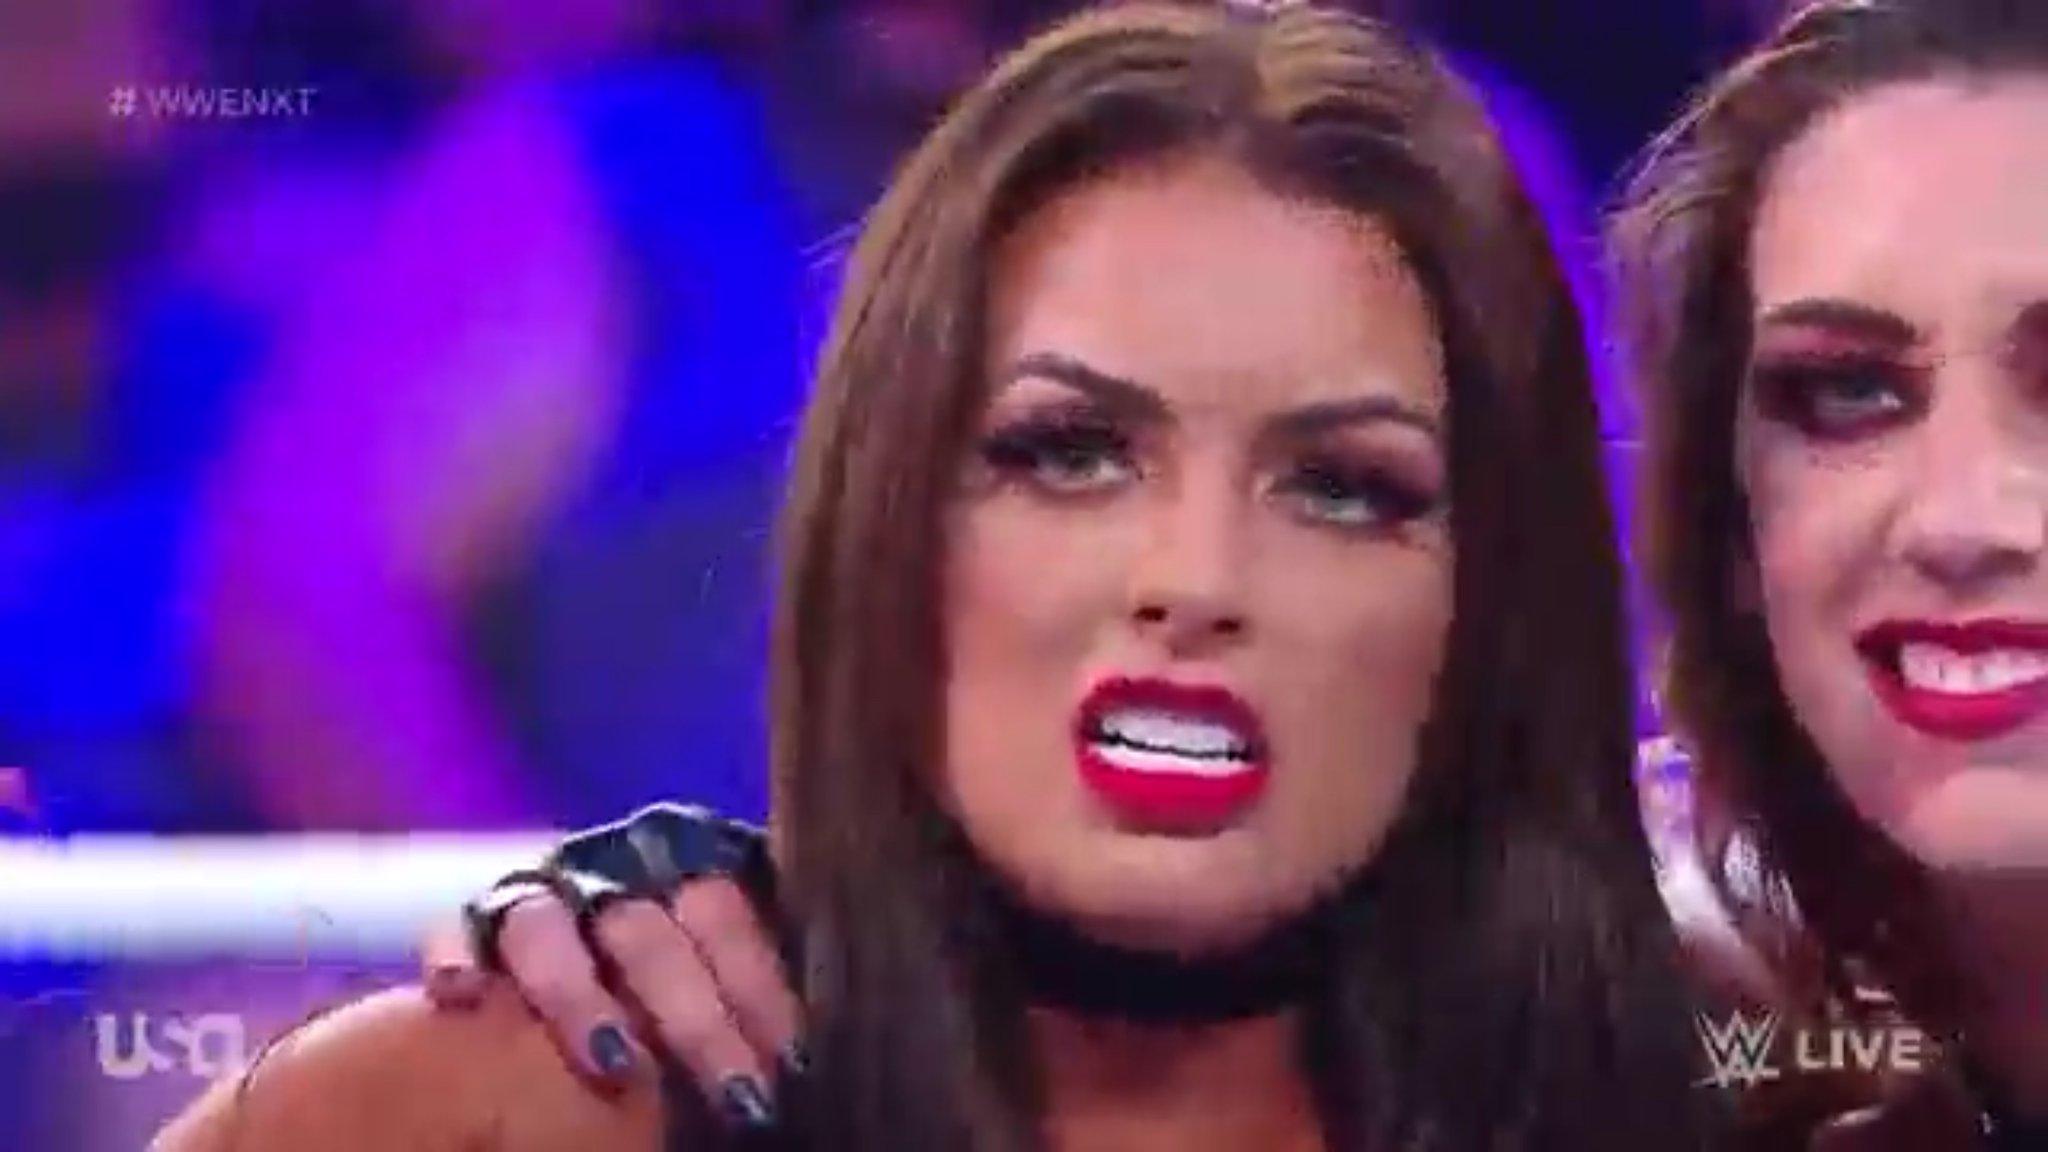 #WWENXT Twitter